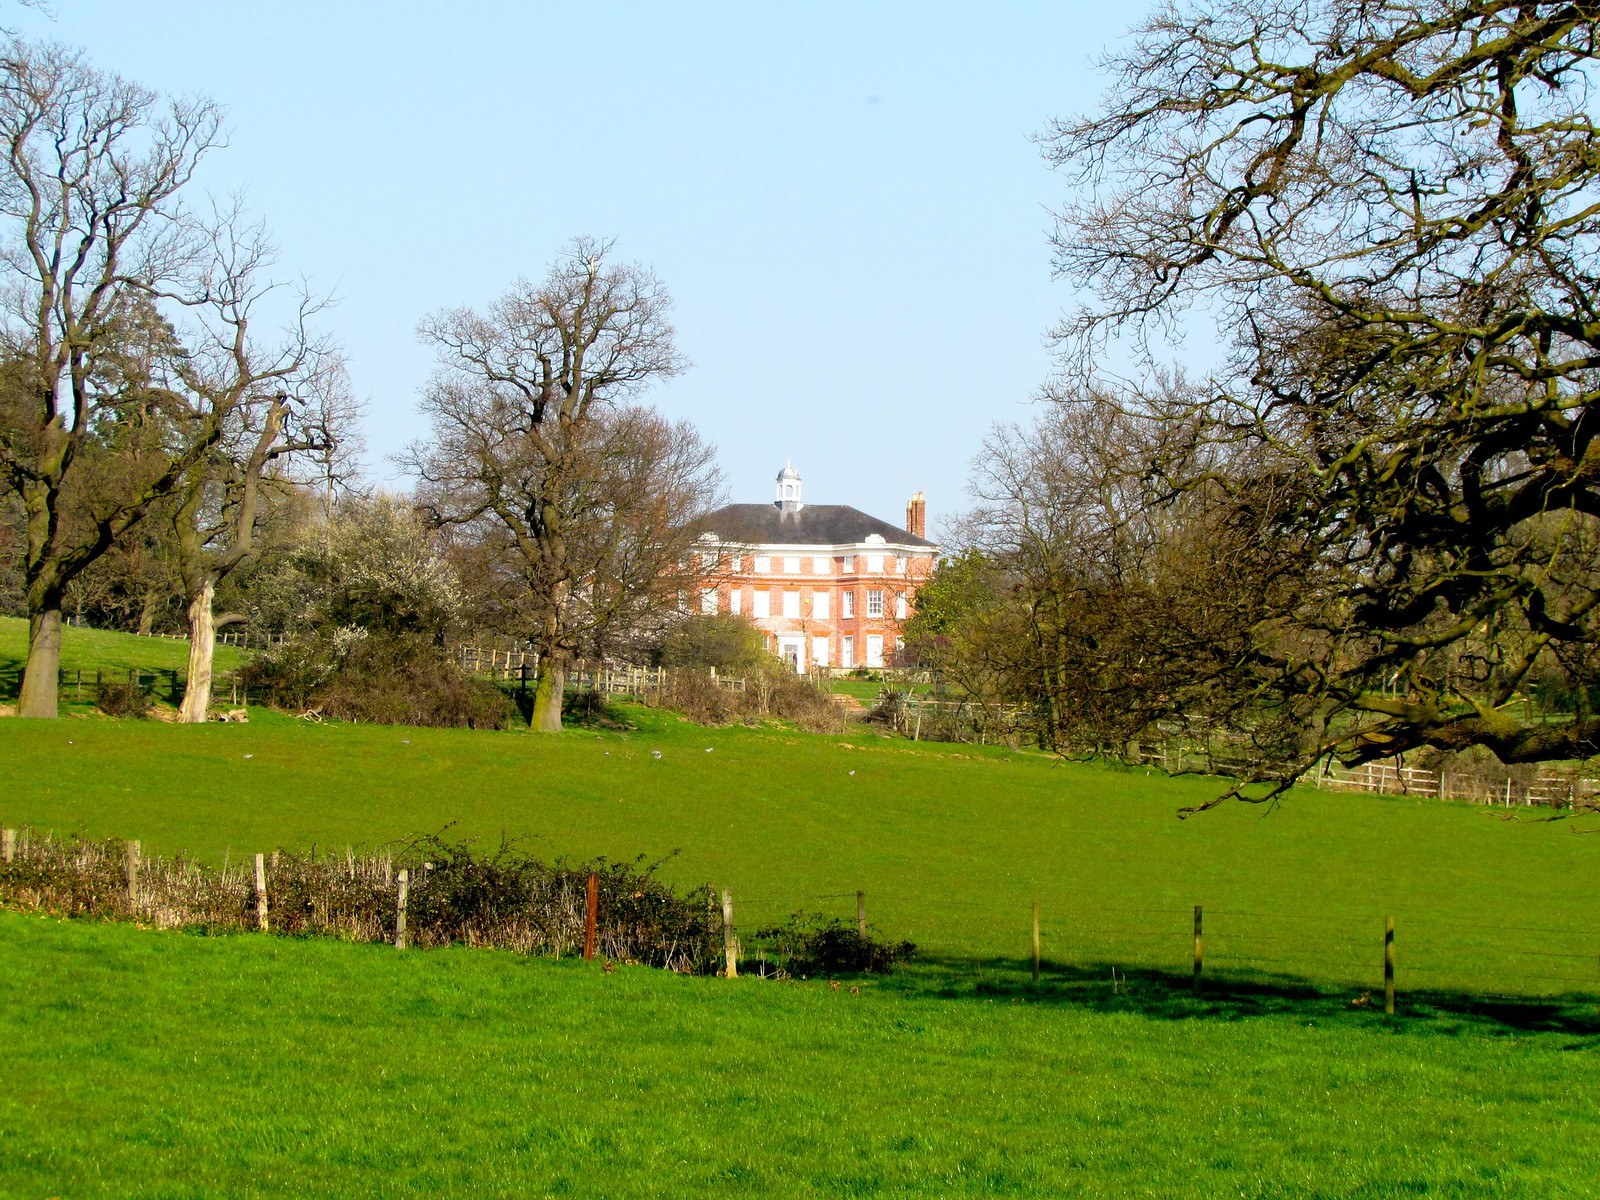 photo from walk Ackworth House